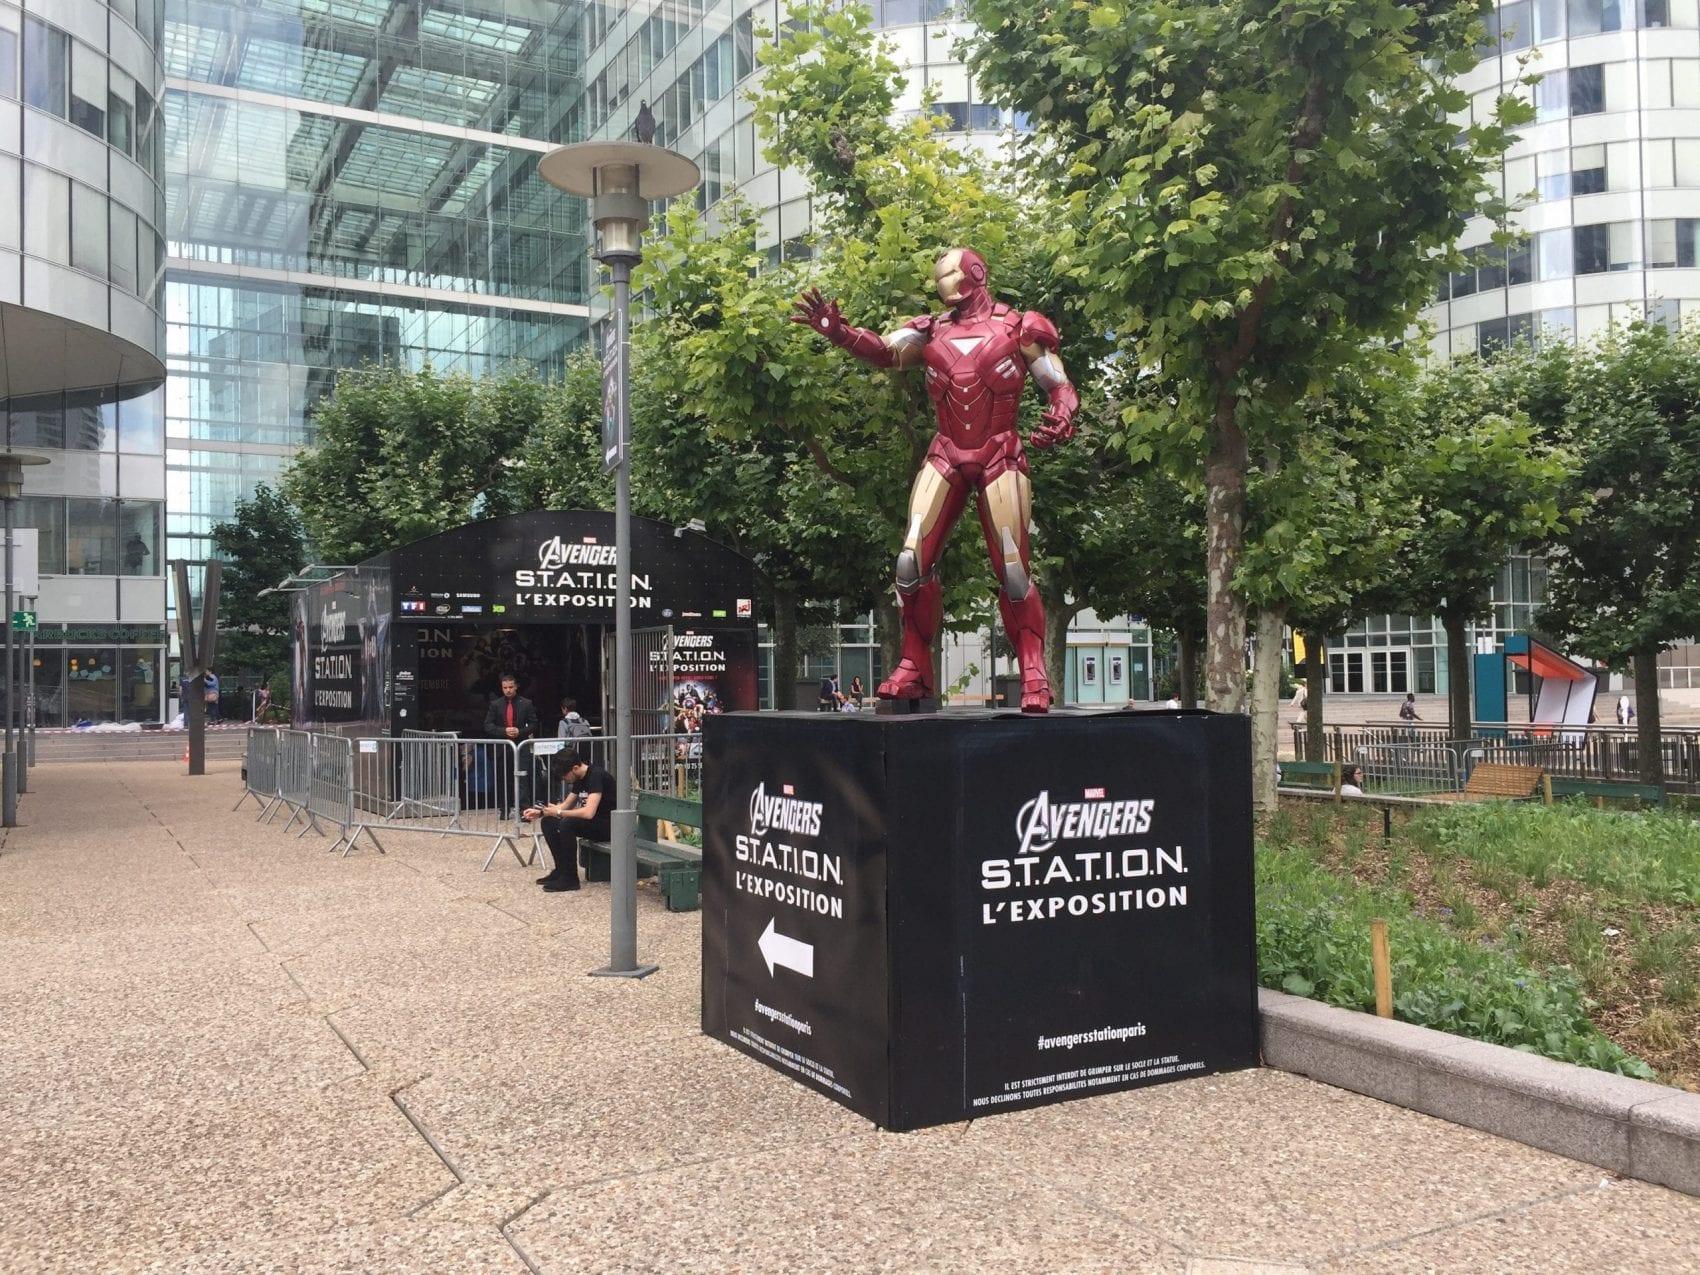 EVENT – Avengers S.T.A.T.I.O.N